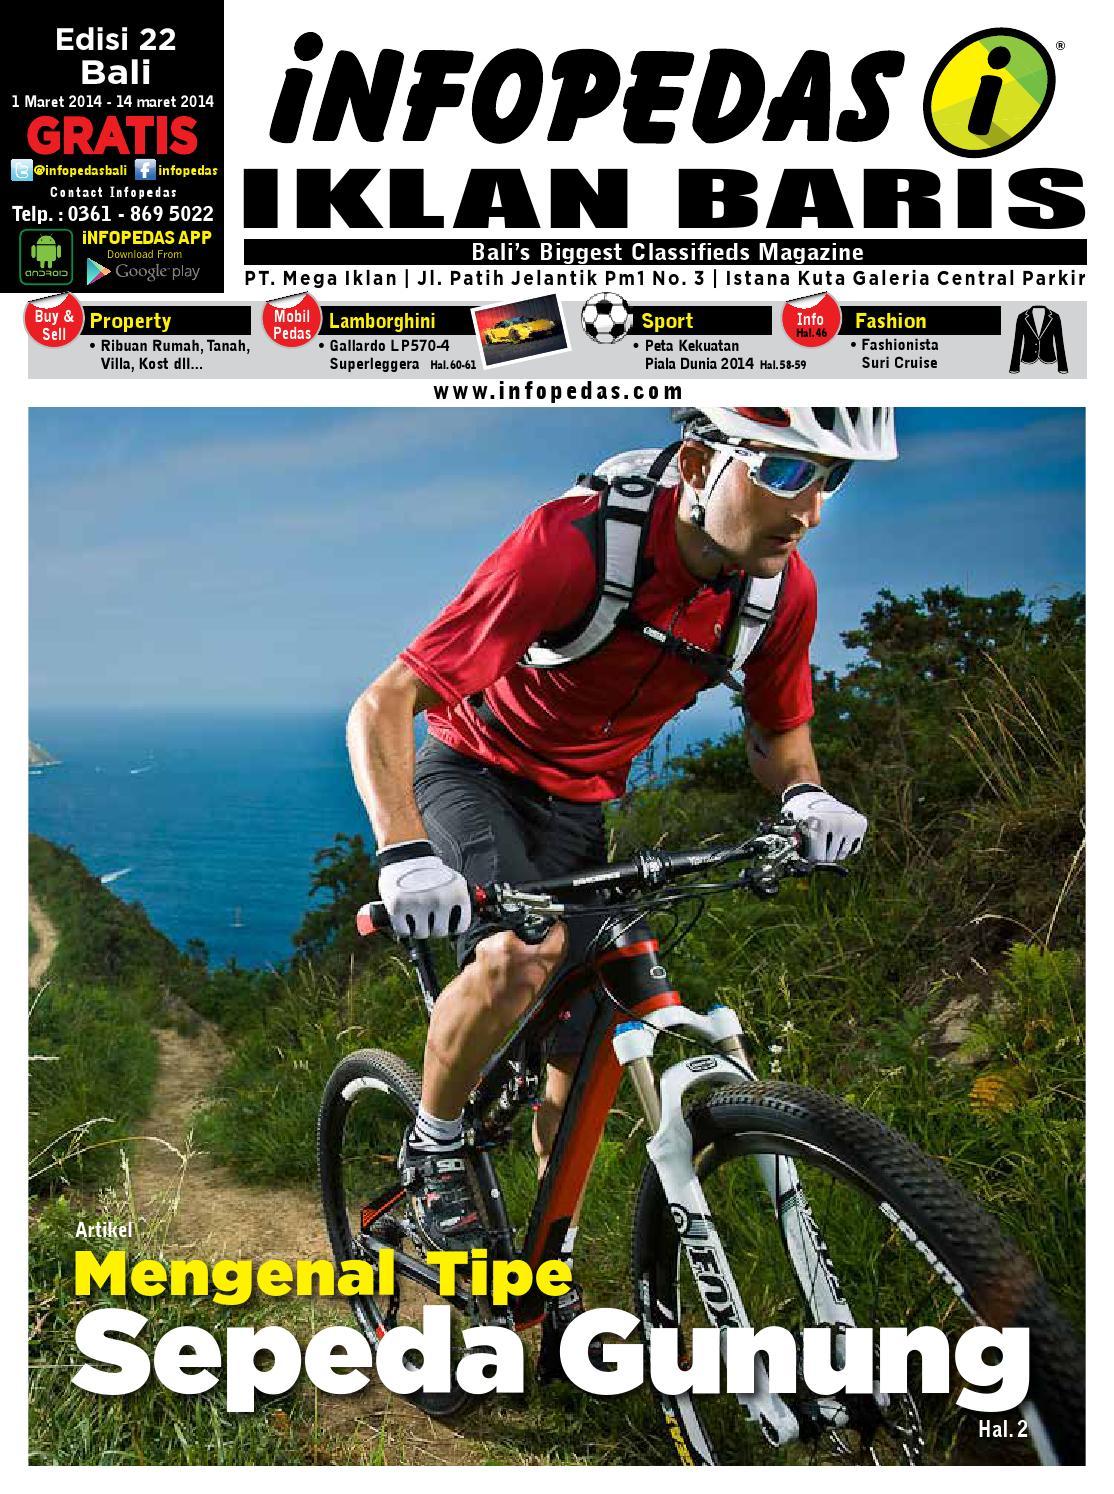 Majalah Infopedas Edisi 22 By Pedas Issuu Tiang Rem C70 Gl Force 1 Grand